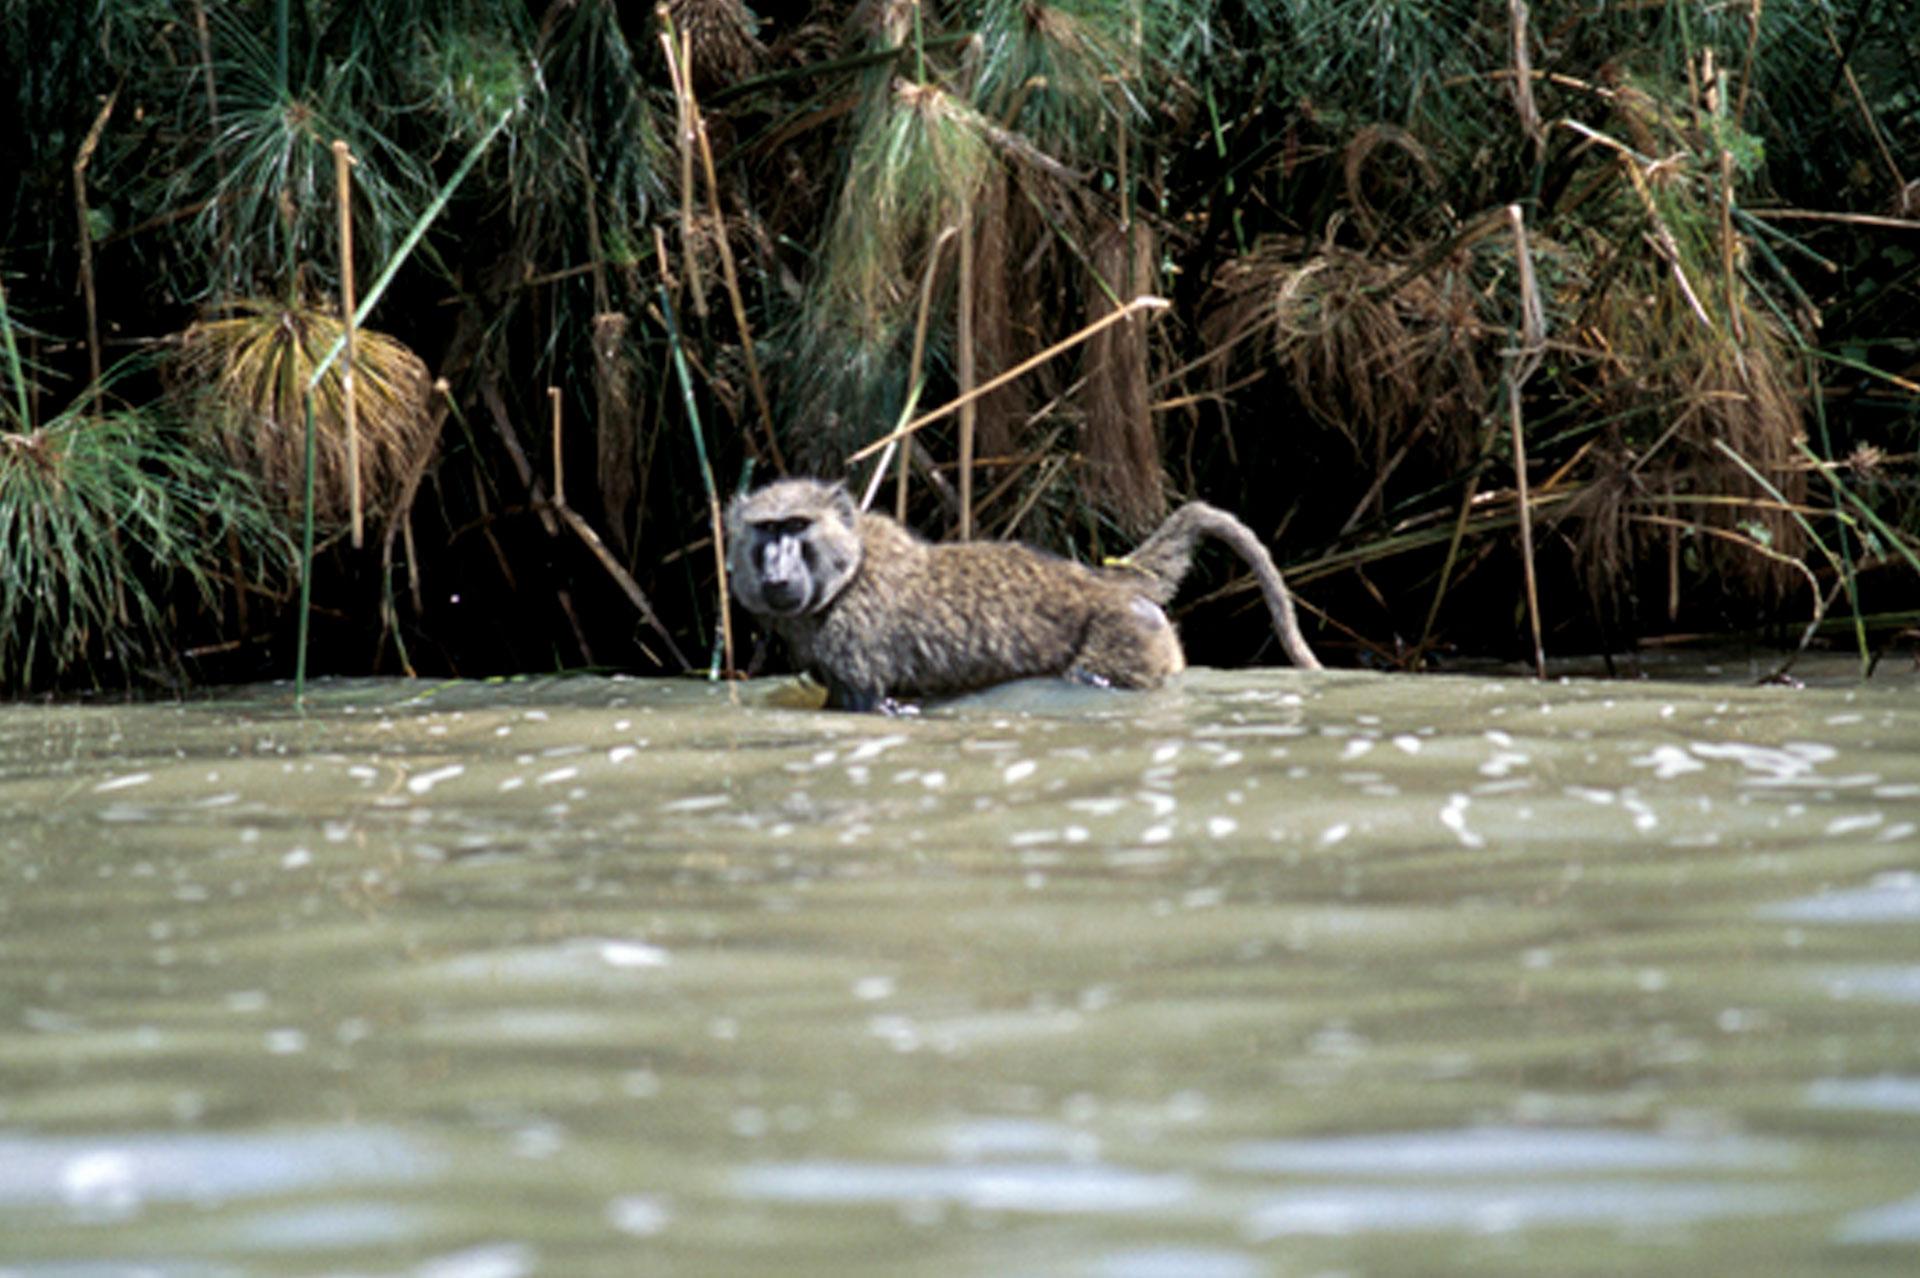 Diani_travel_center_National_parks_in_kenya_Ndere_National_park_image_4